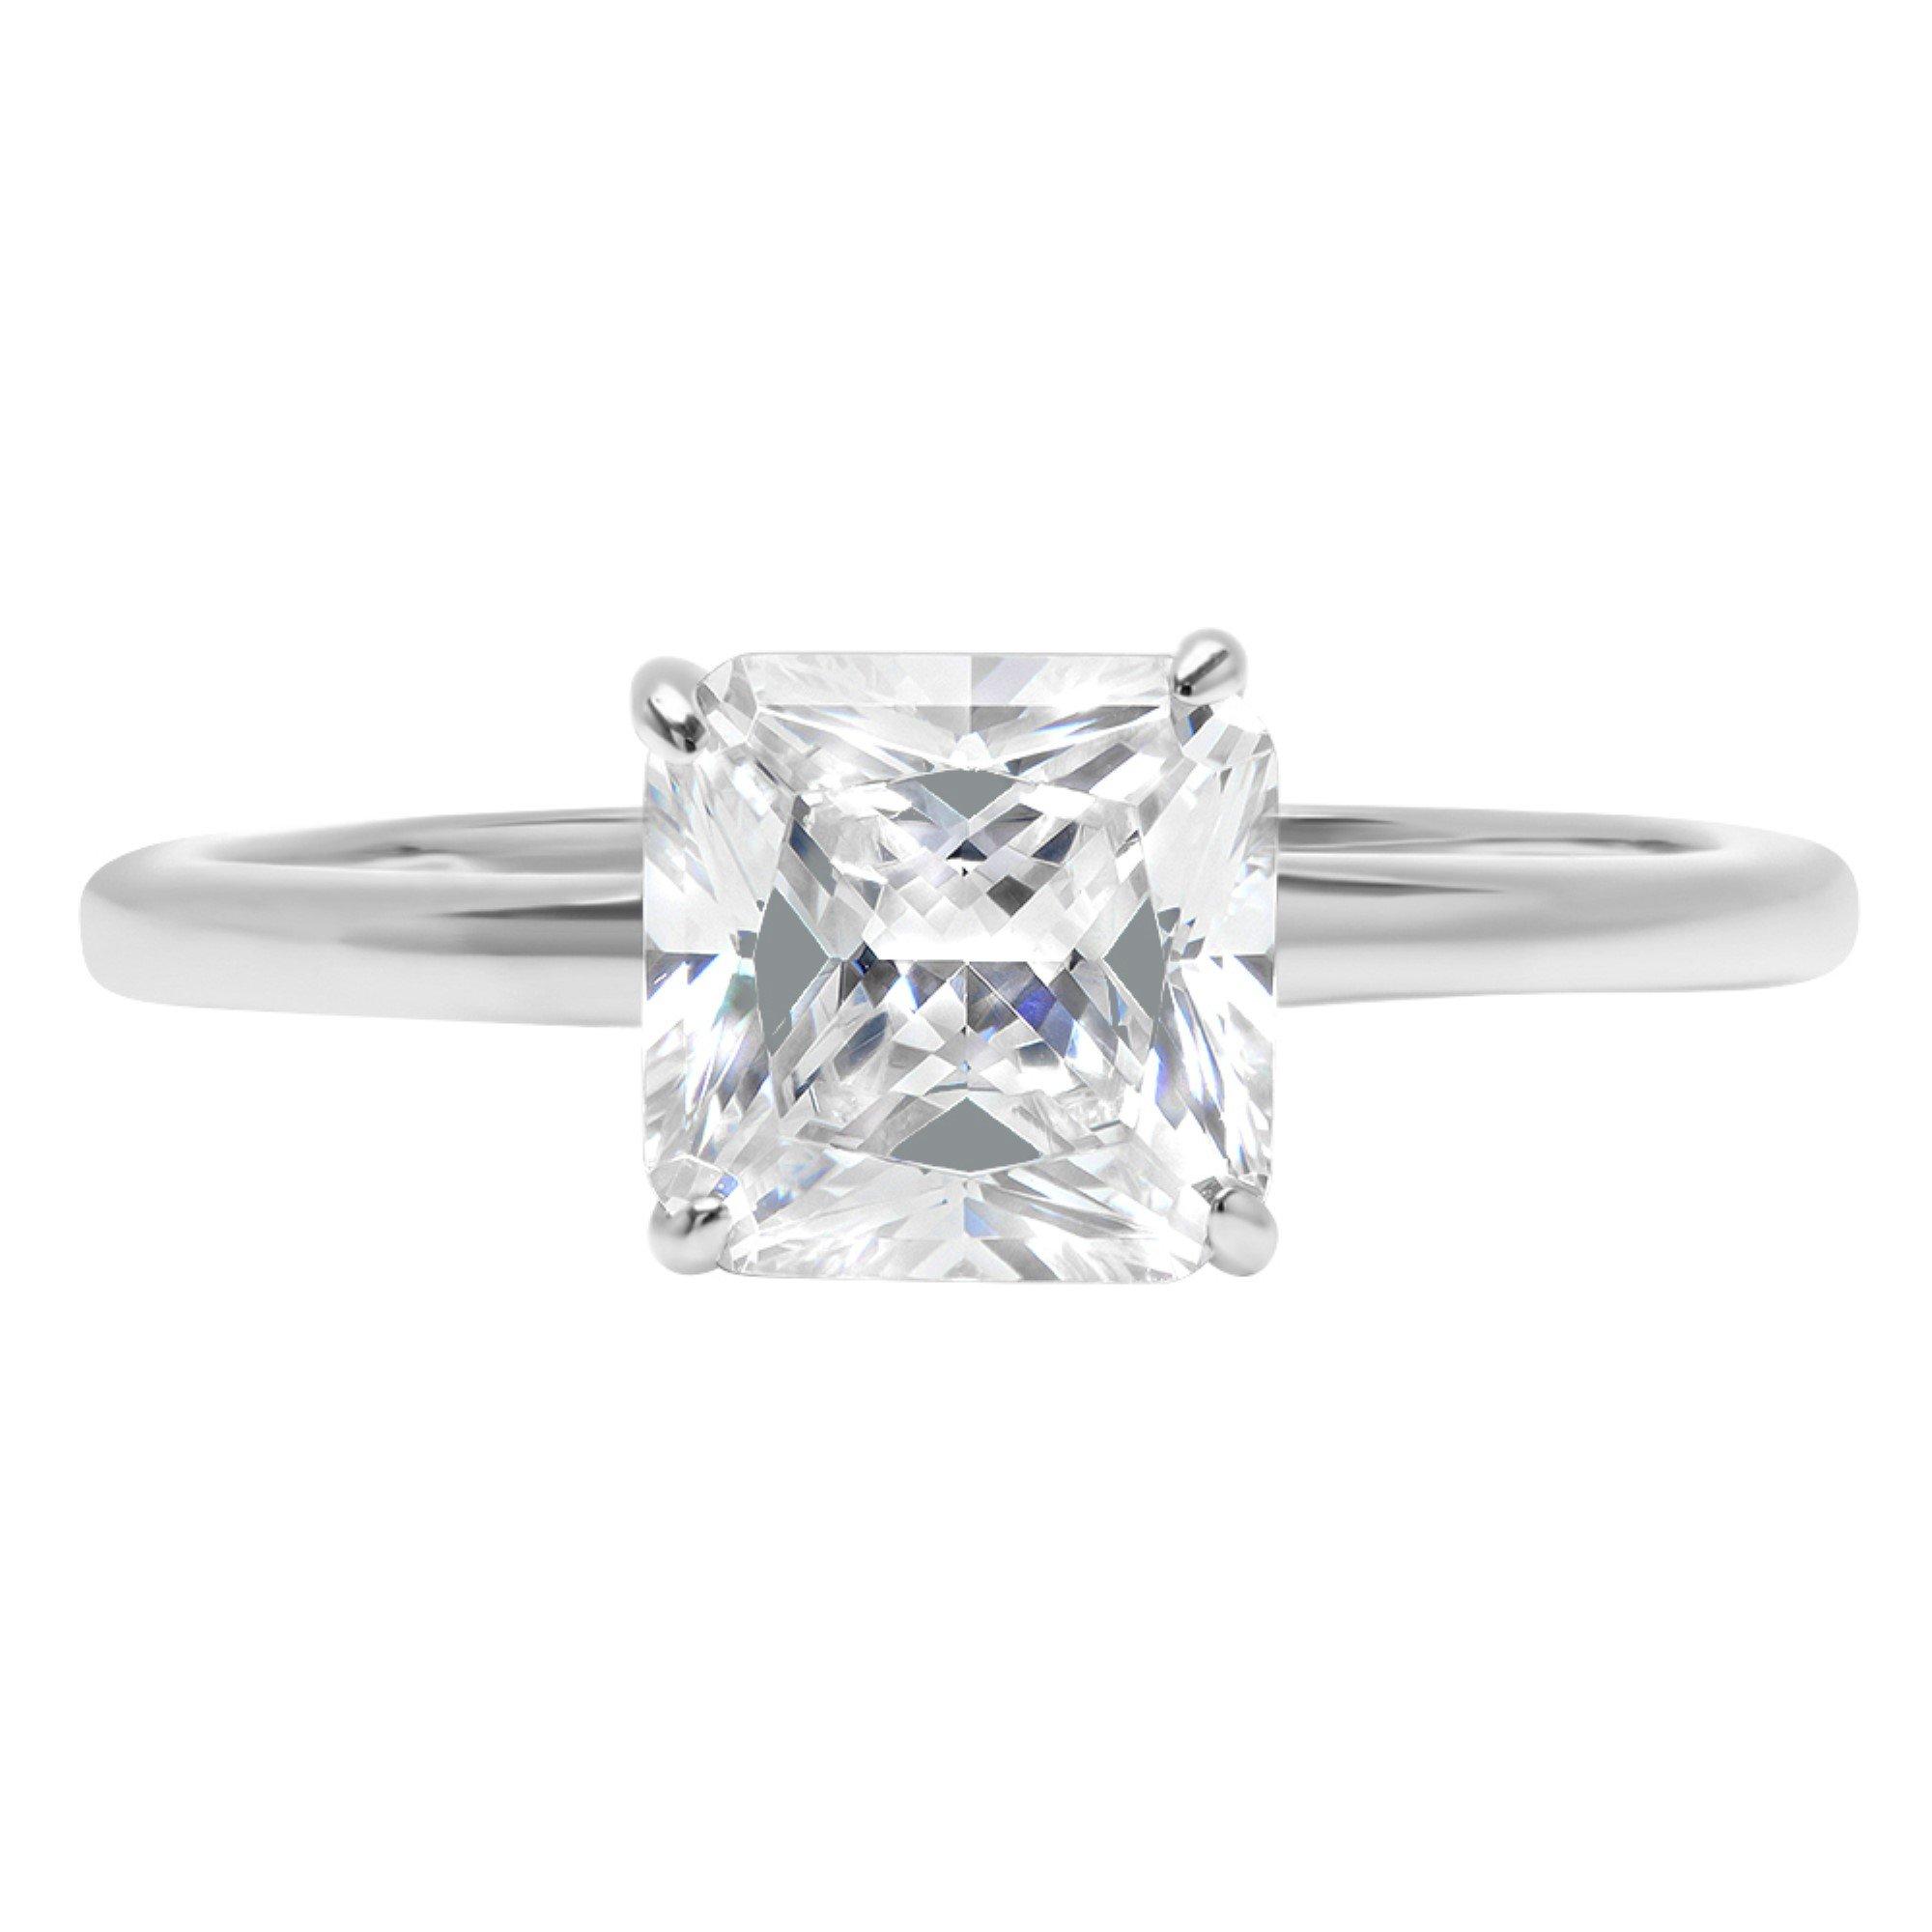 14k White Gold 0.8ct Asscher Brilliant Cut Classic Solitaire Designer Wedding Bridal Statement Anniversary Engagement Promise Ring Solid, 11, 11